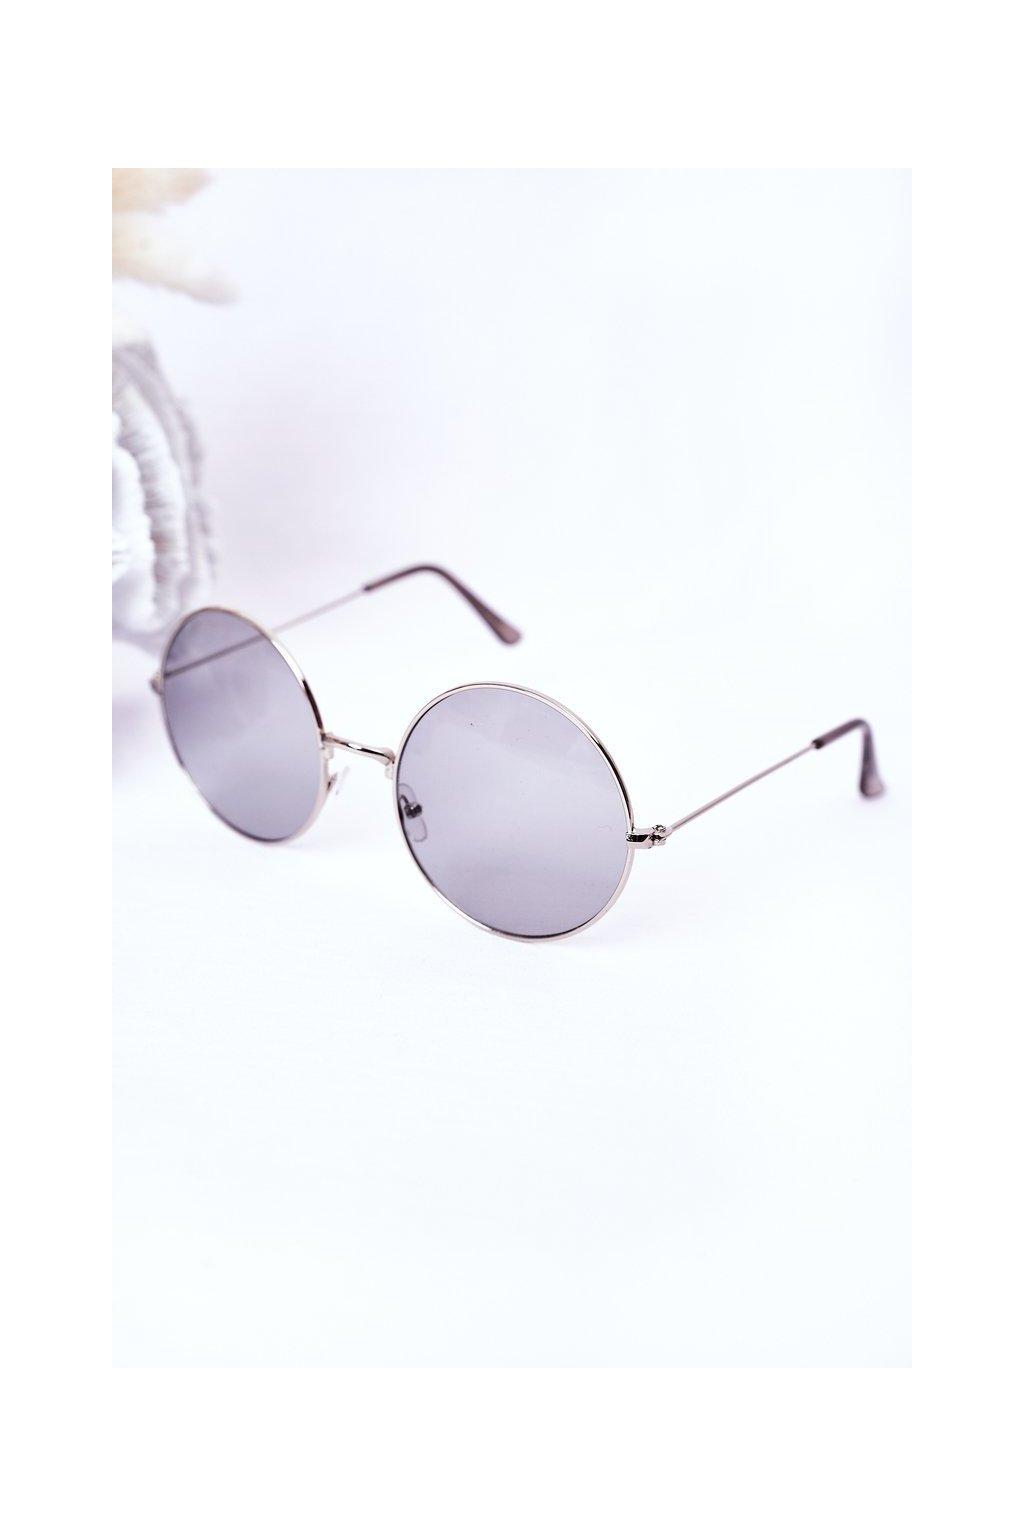 Módne slnečné okuliare LOOKS STYLE sivé VINSENT003 GREY